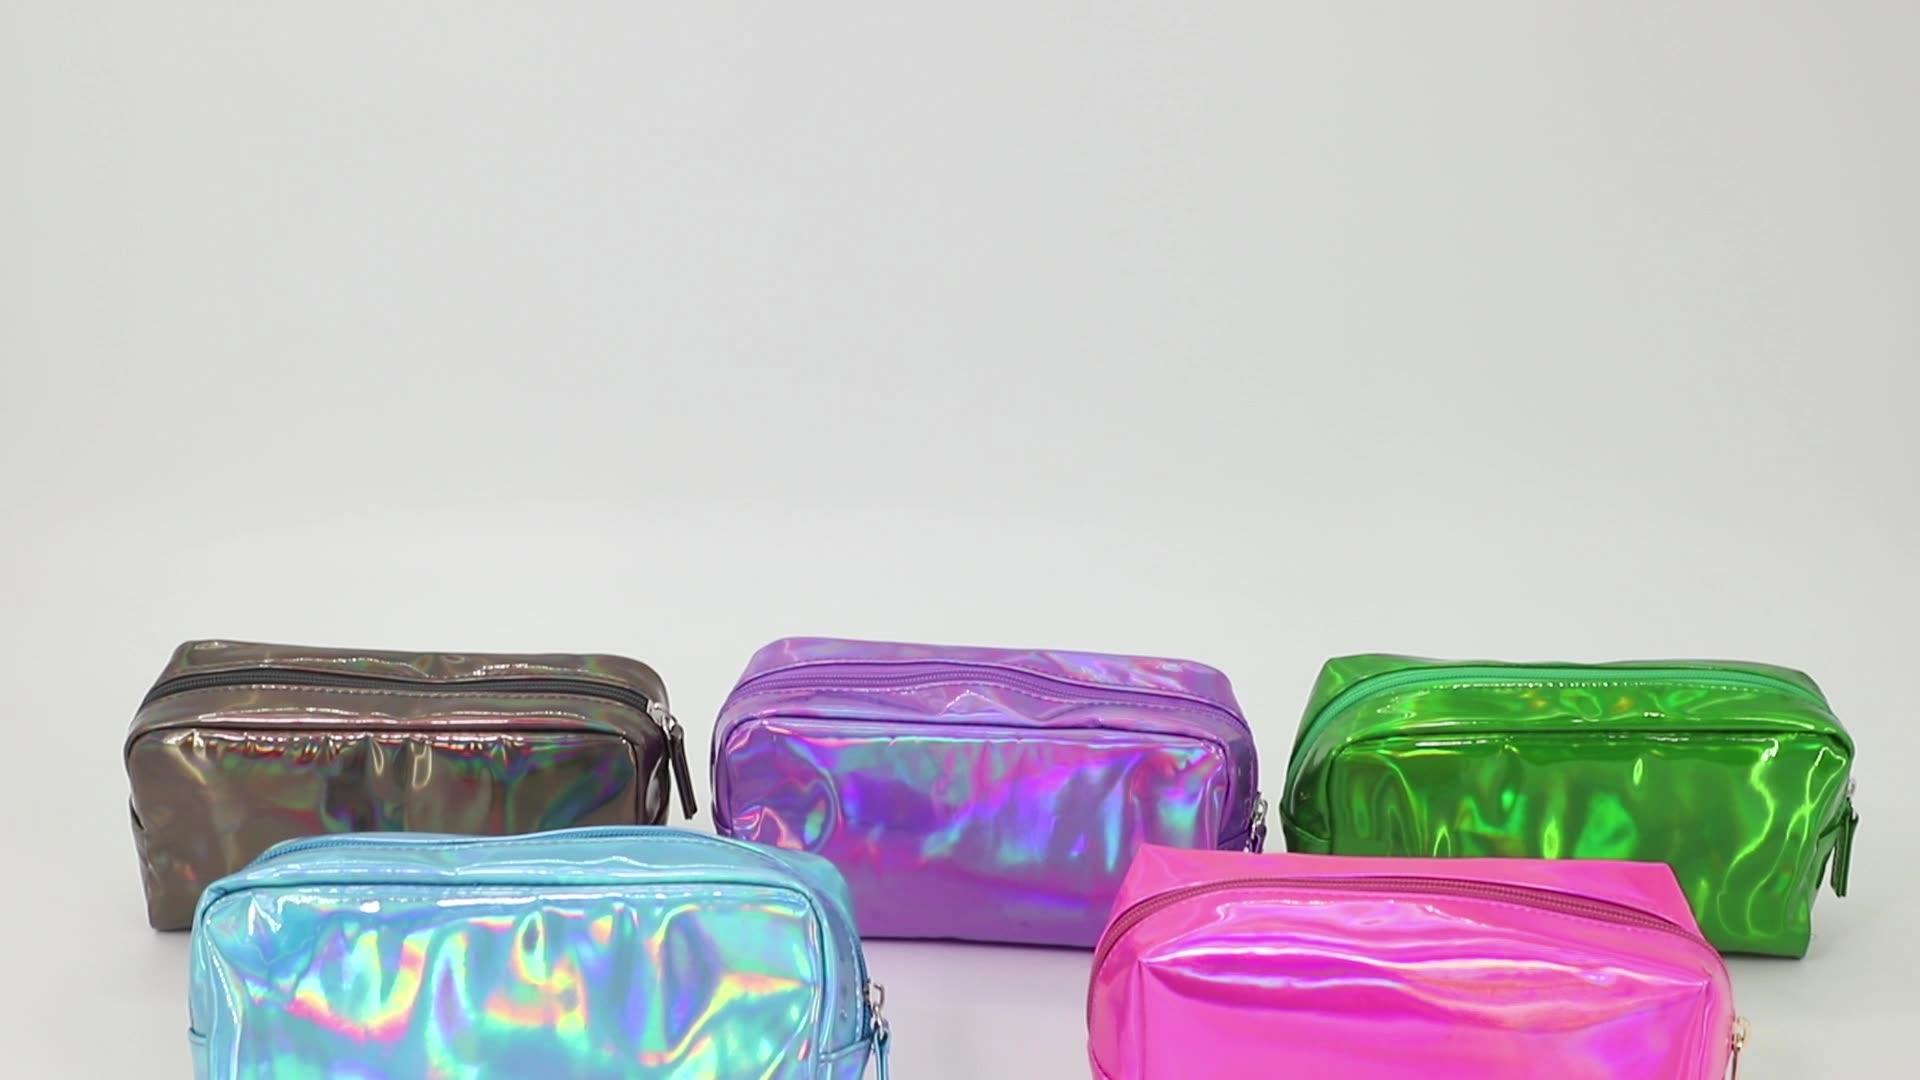 Embroidered Logo Terry Velour Wet Bikini Bag For Gift Promotion